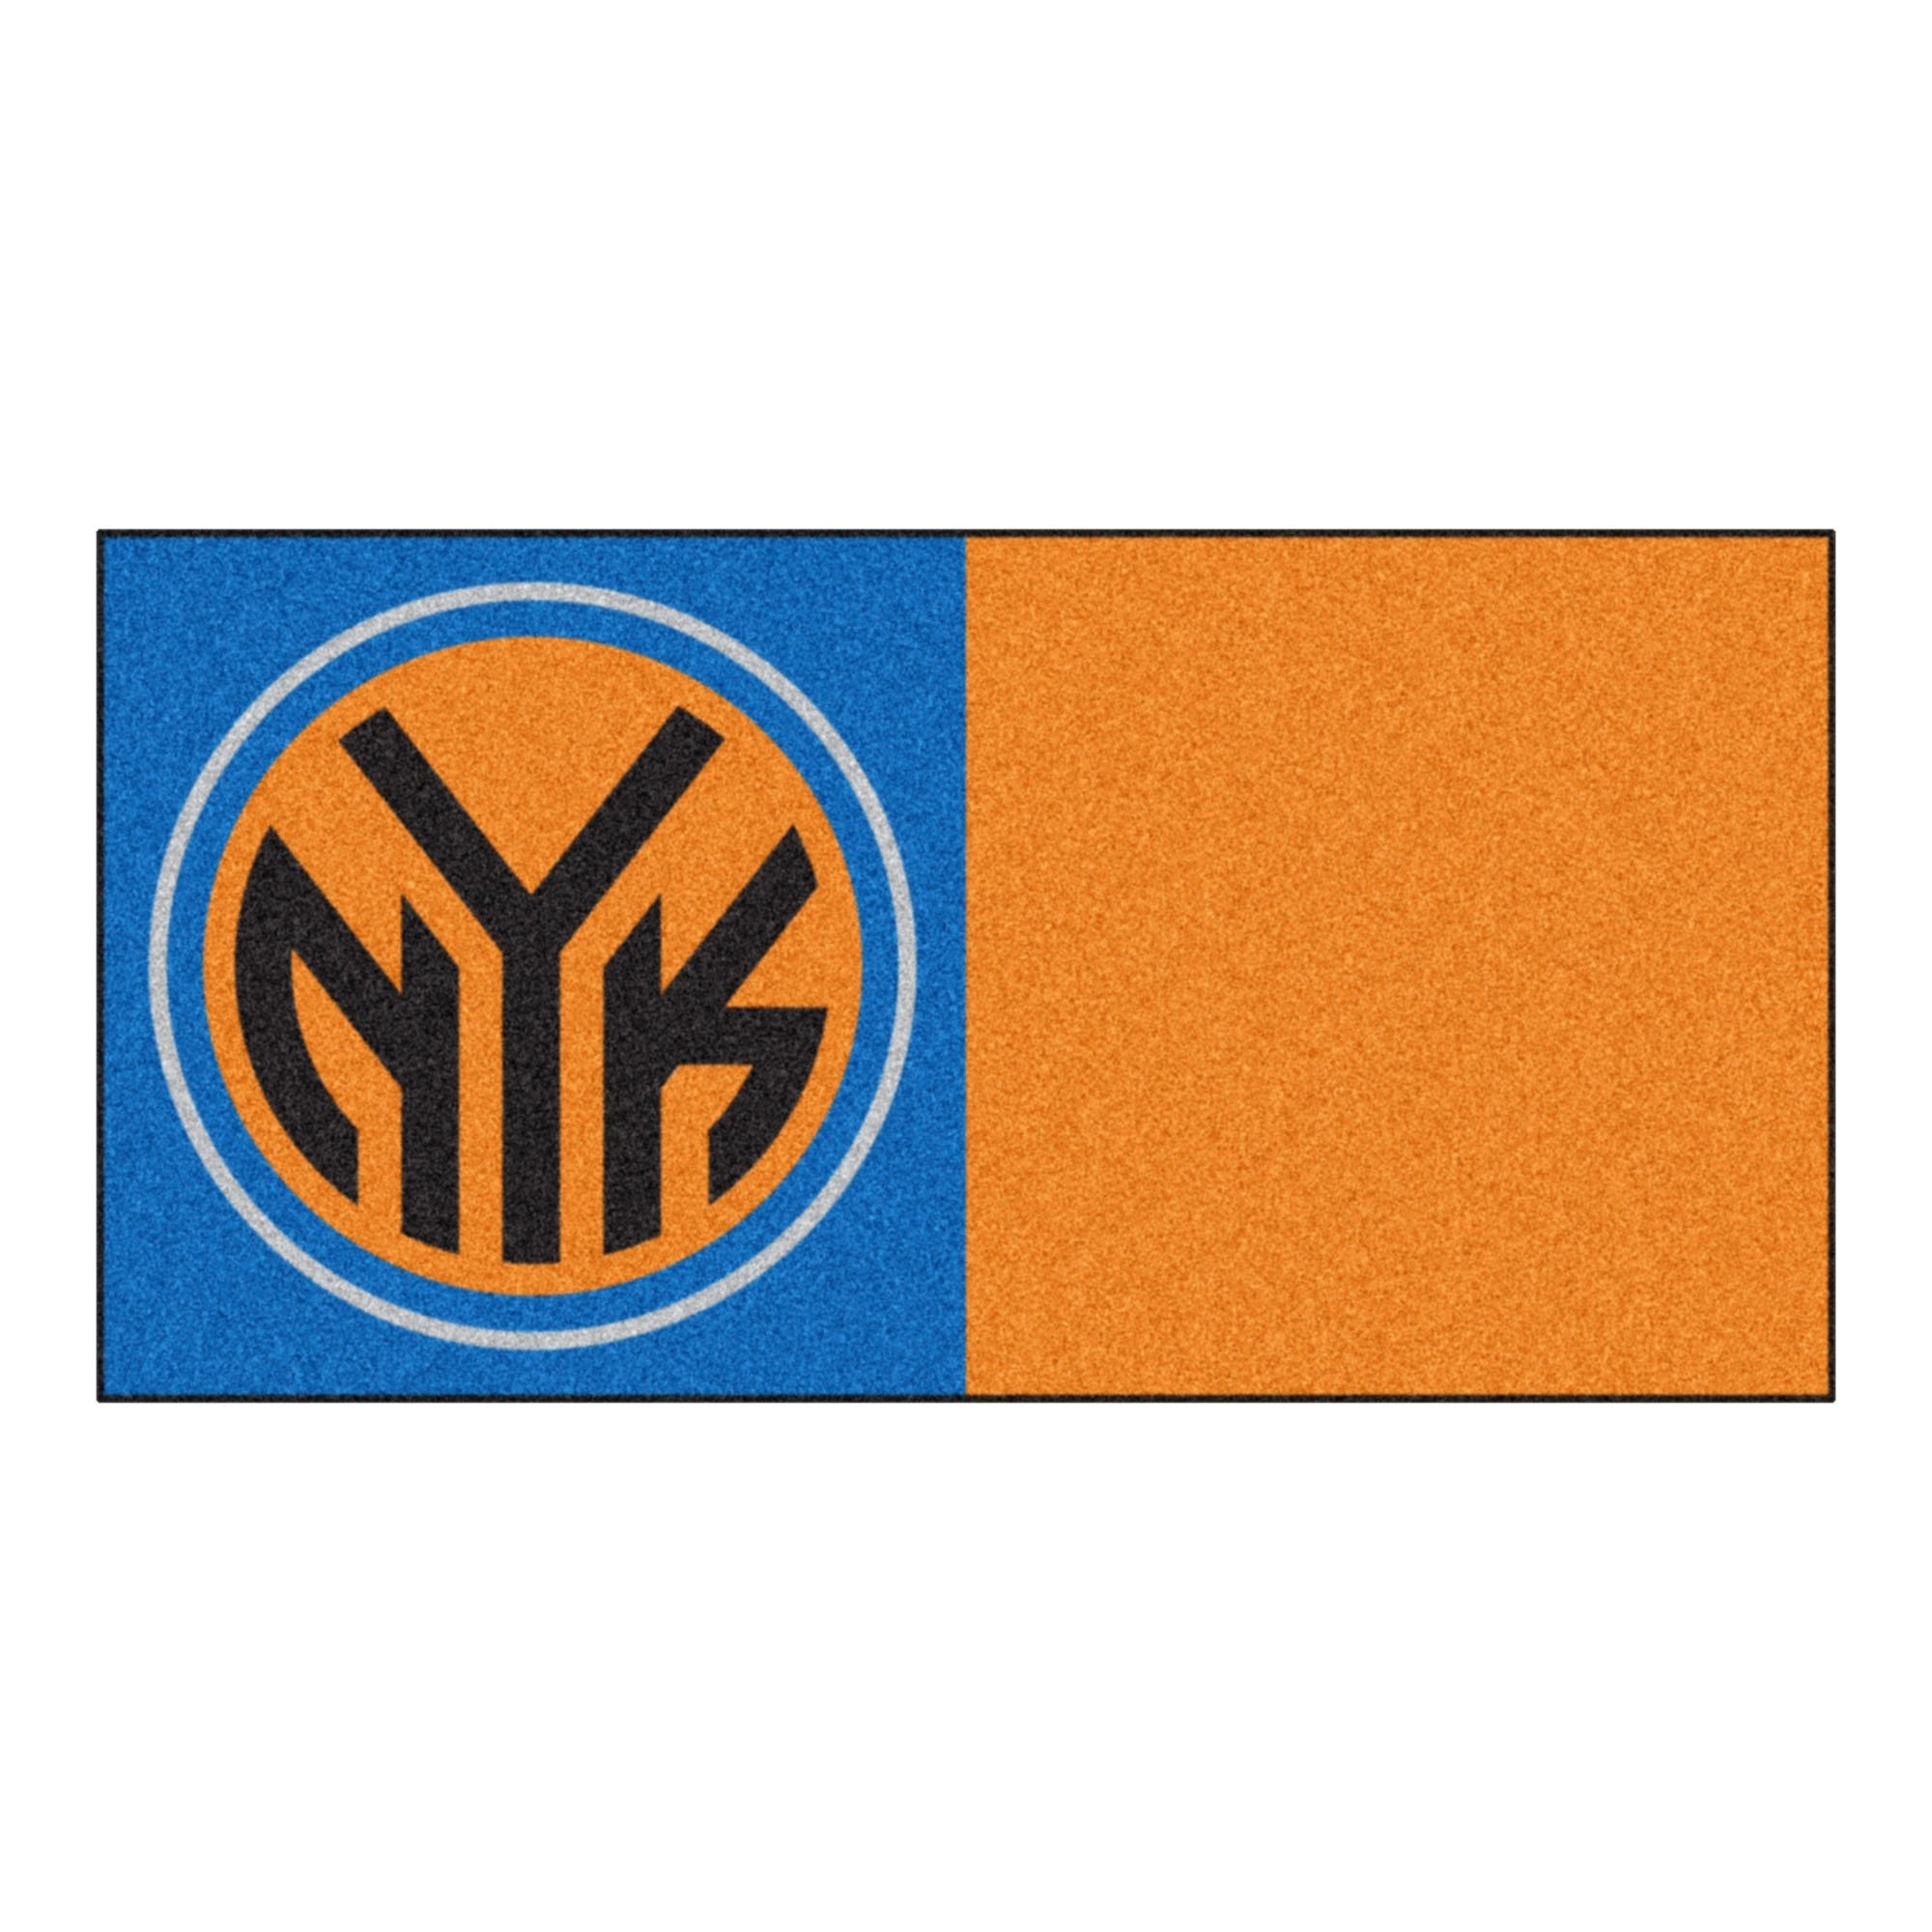 FANMATS NBA New York Knicks Nylon Face Team Carpet Tiles by Fanmats